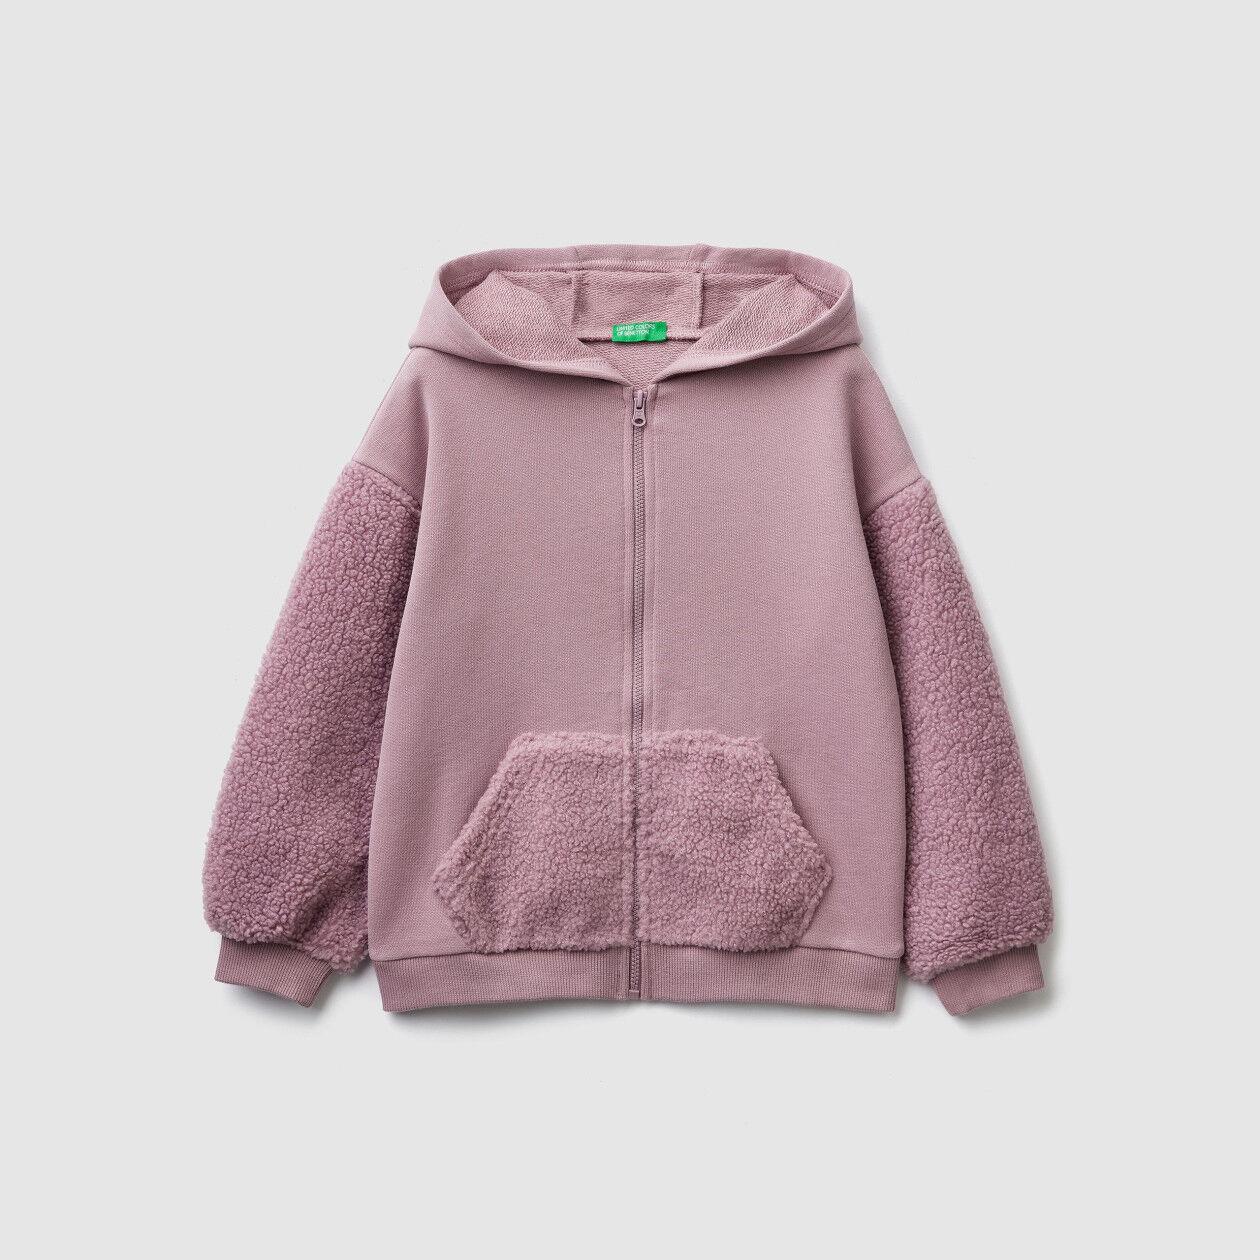 Fleece sleeves and pockets sweatshirt